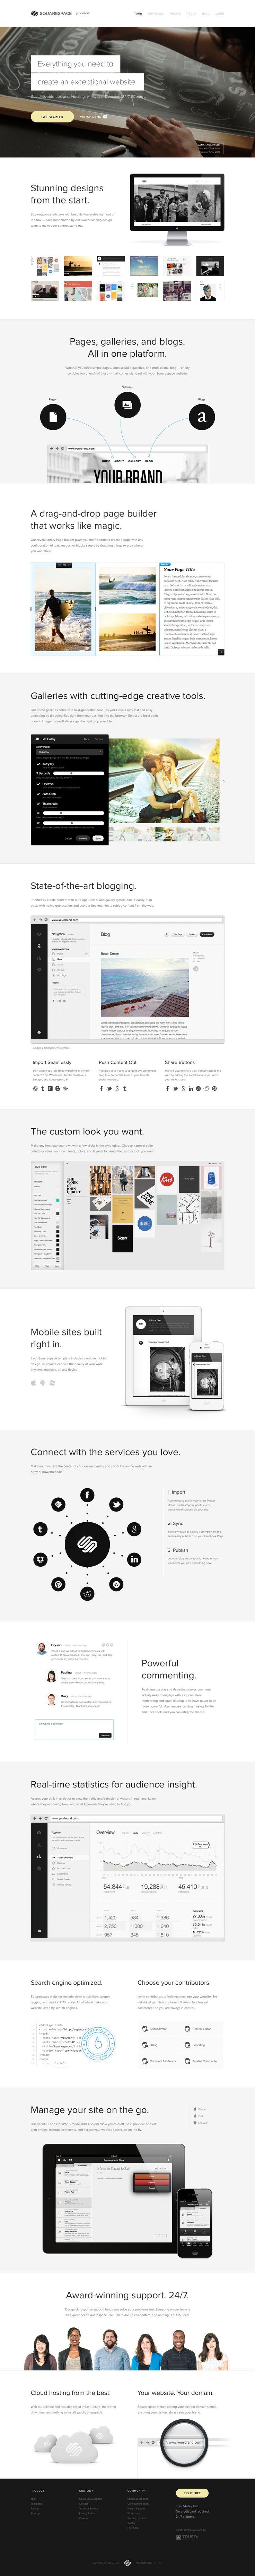 Unique Web Design, SquareSpace #Web #Design